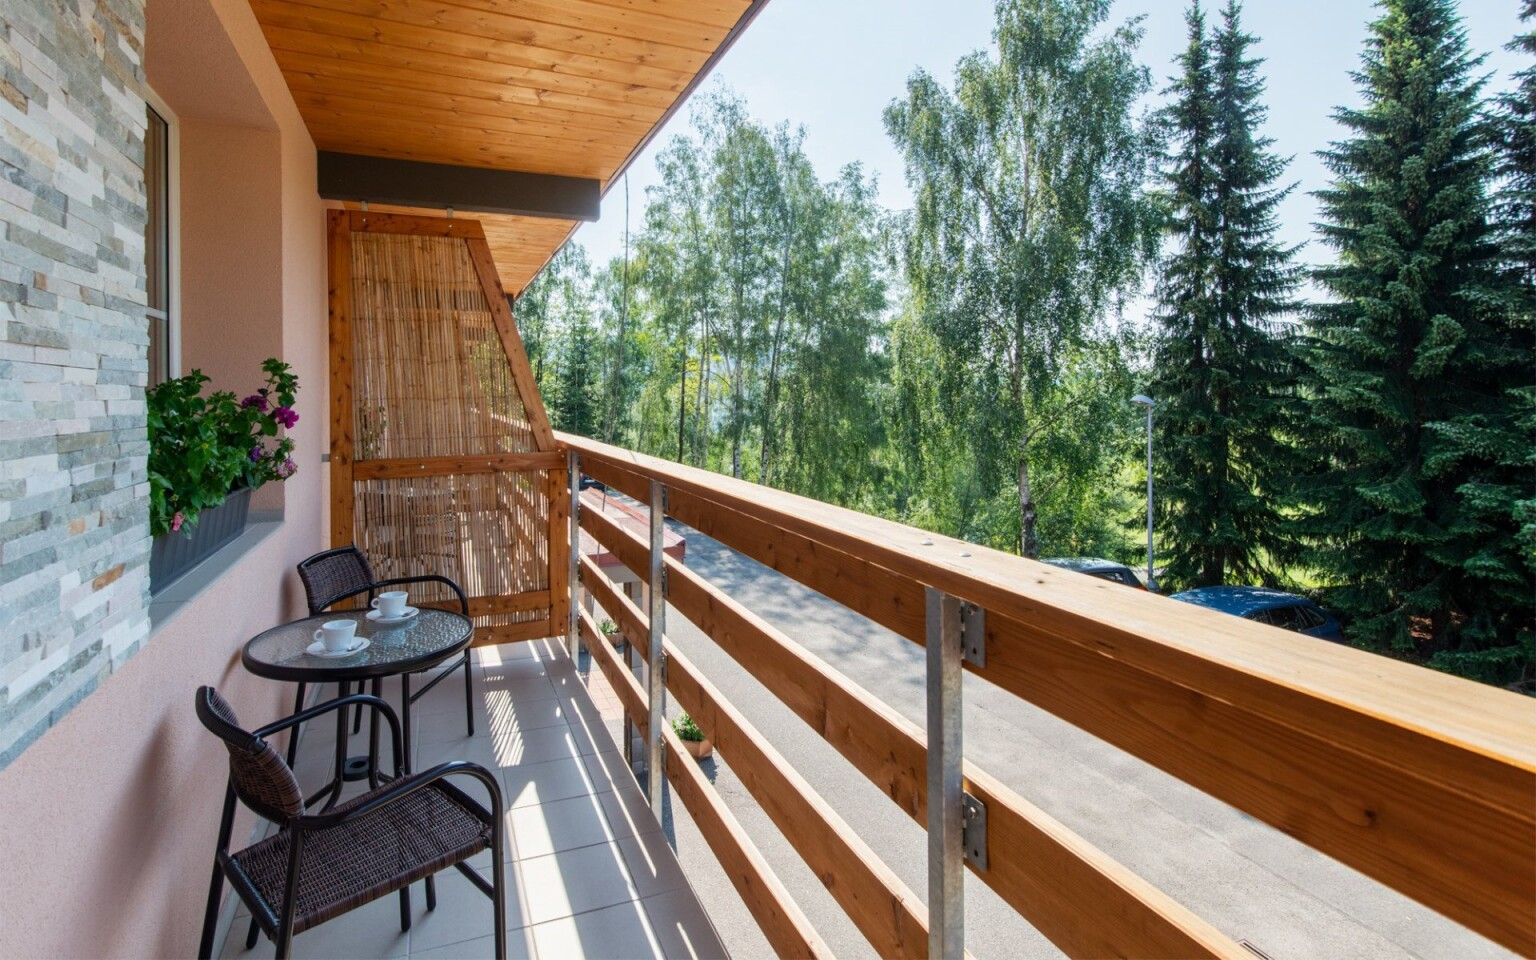 Pokoje, balkon, Hotel Bon, Tanvald, Jizerské hory